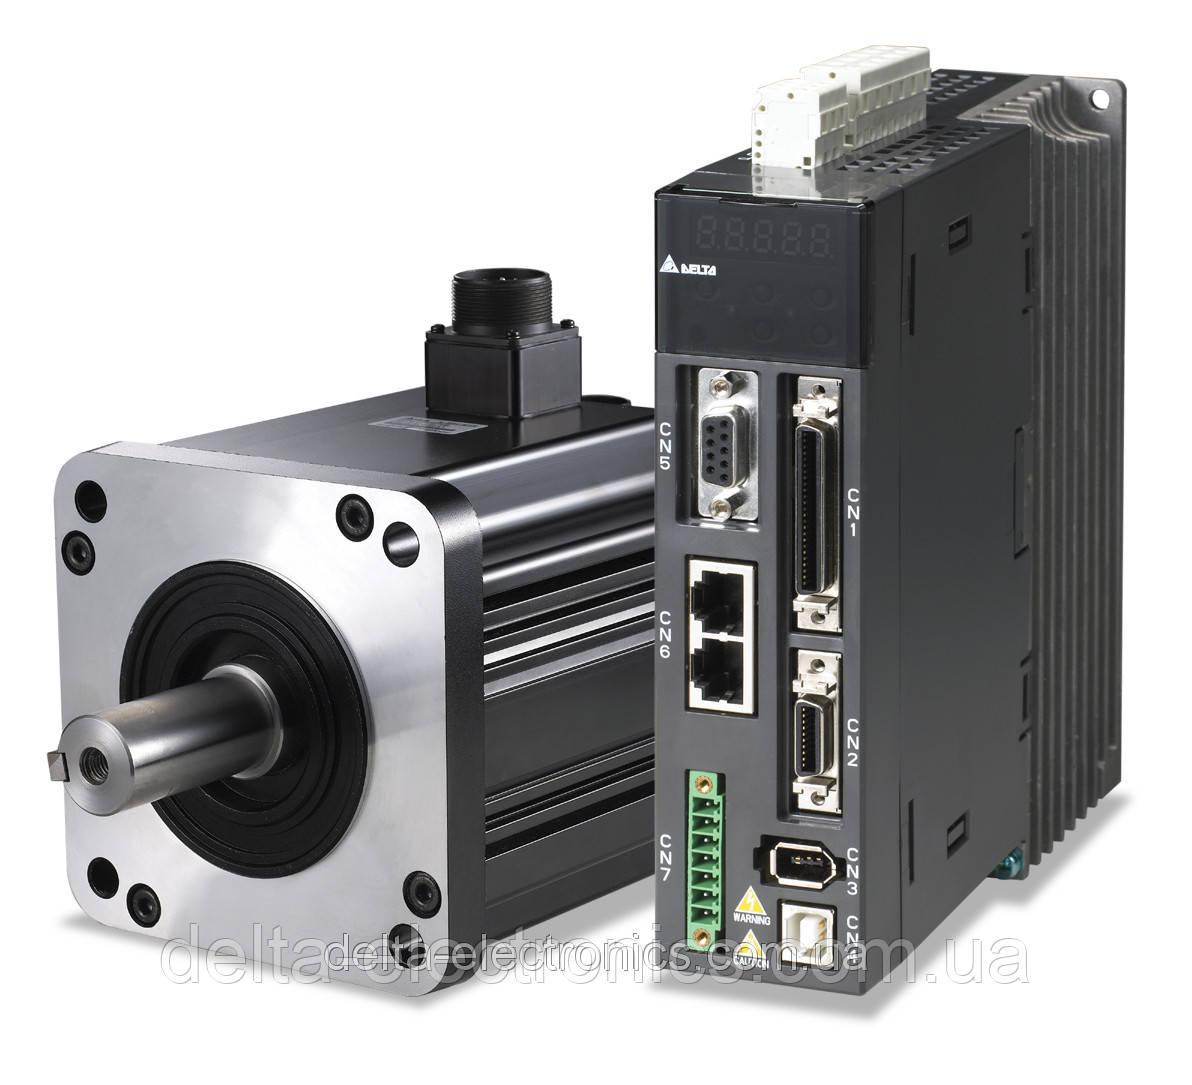 Комплект сервопривода A2, 200Вт, 1-ф, 230В, номин.момент 0,64Нм., 3000об./мин. энкодер 20 бит